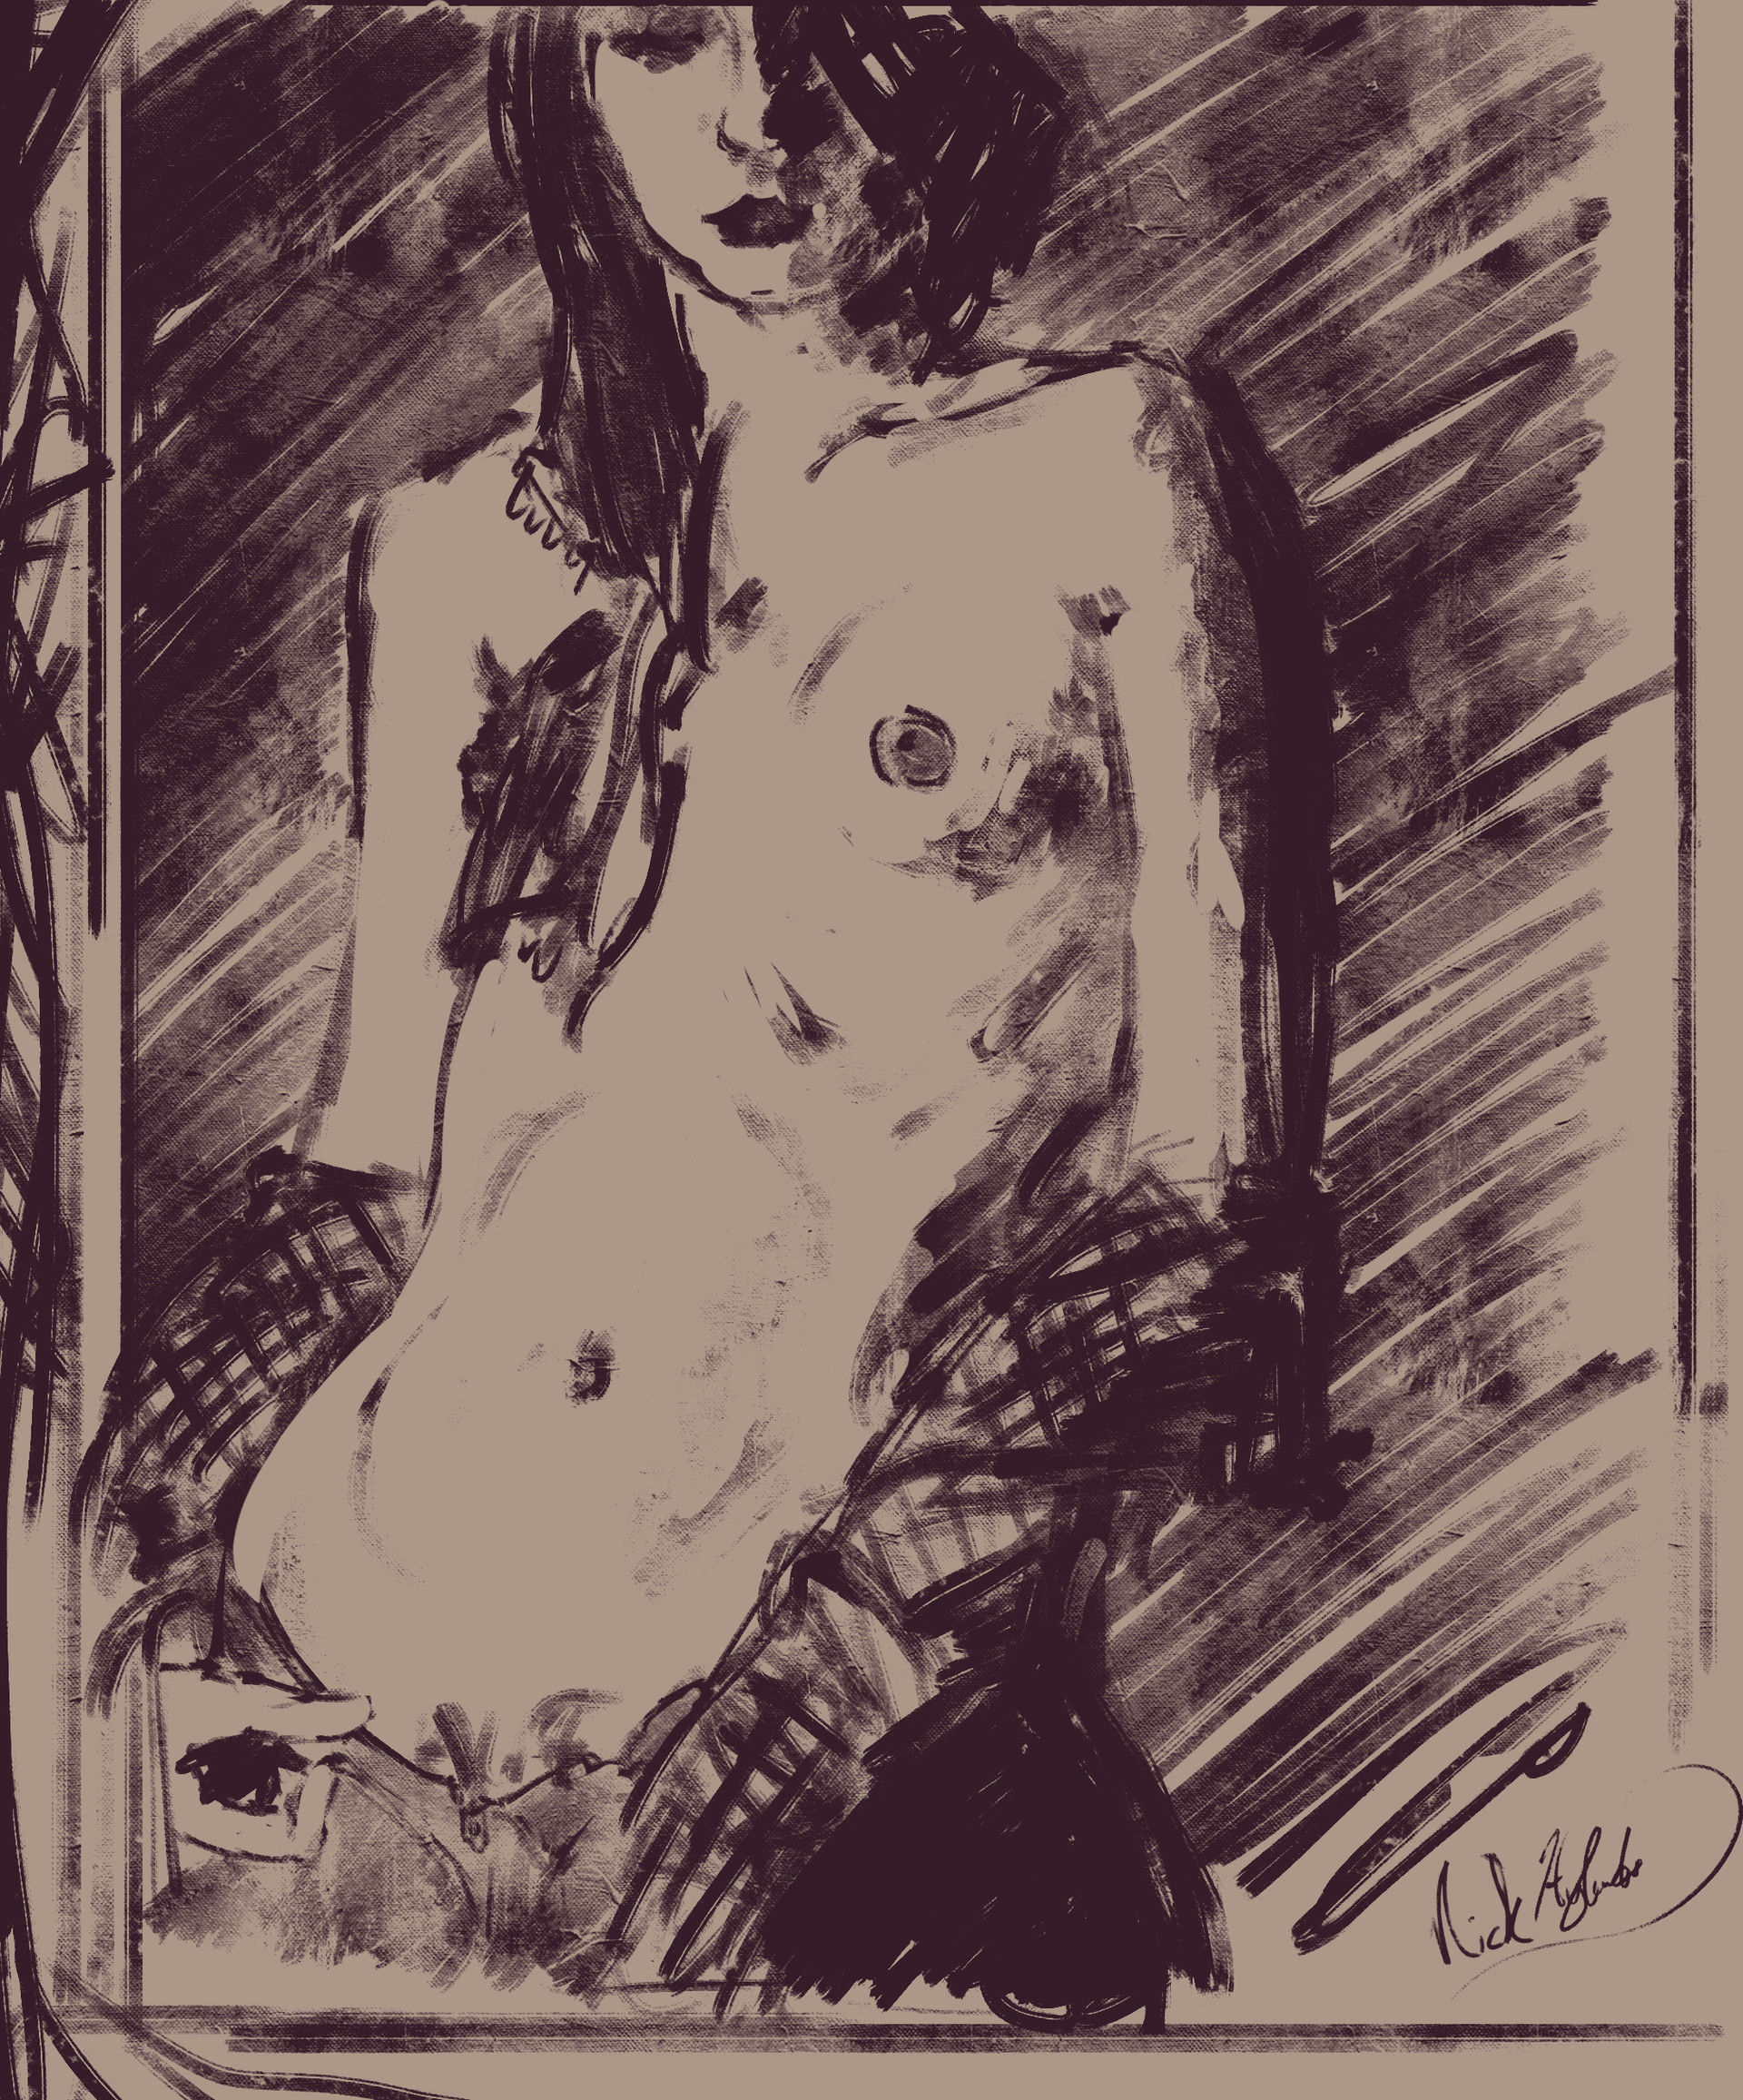 Nicholas hylands charcoal sketch